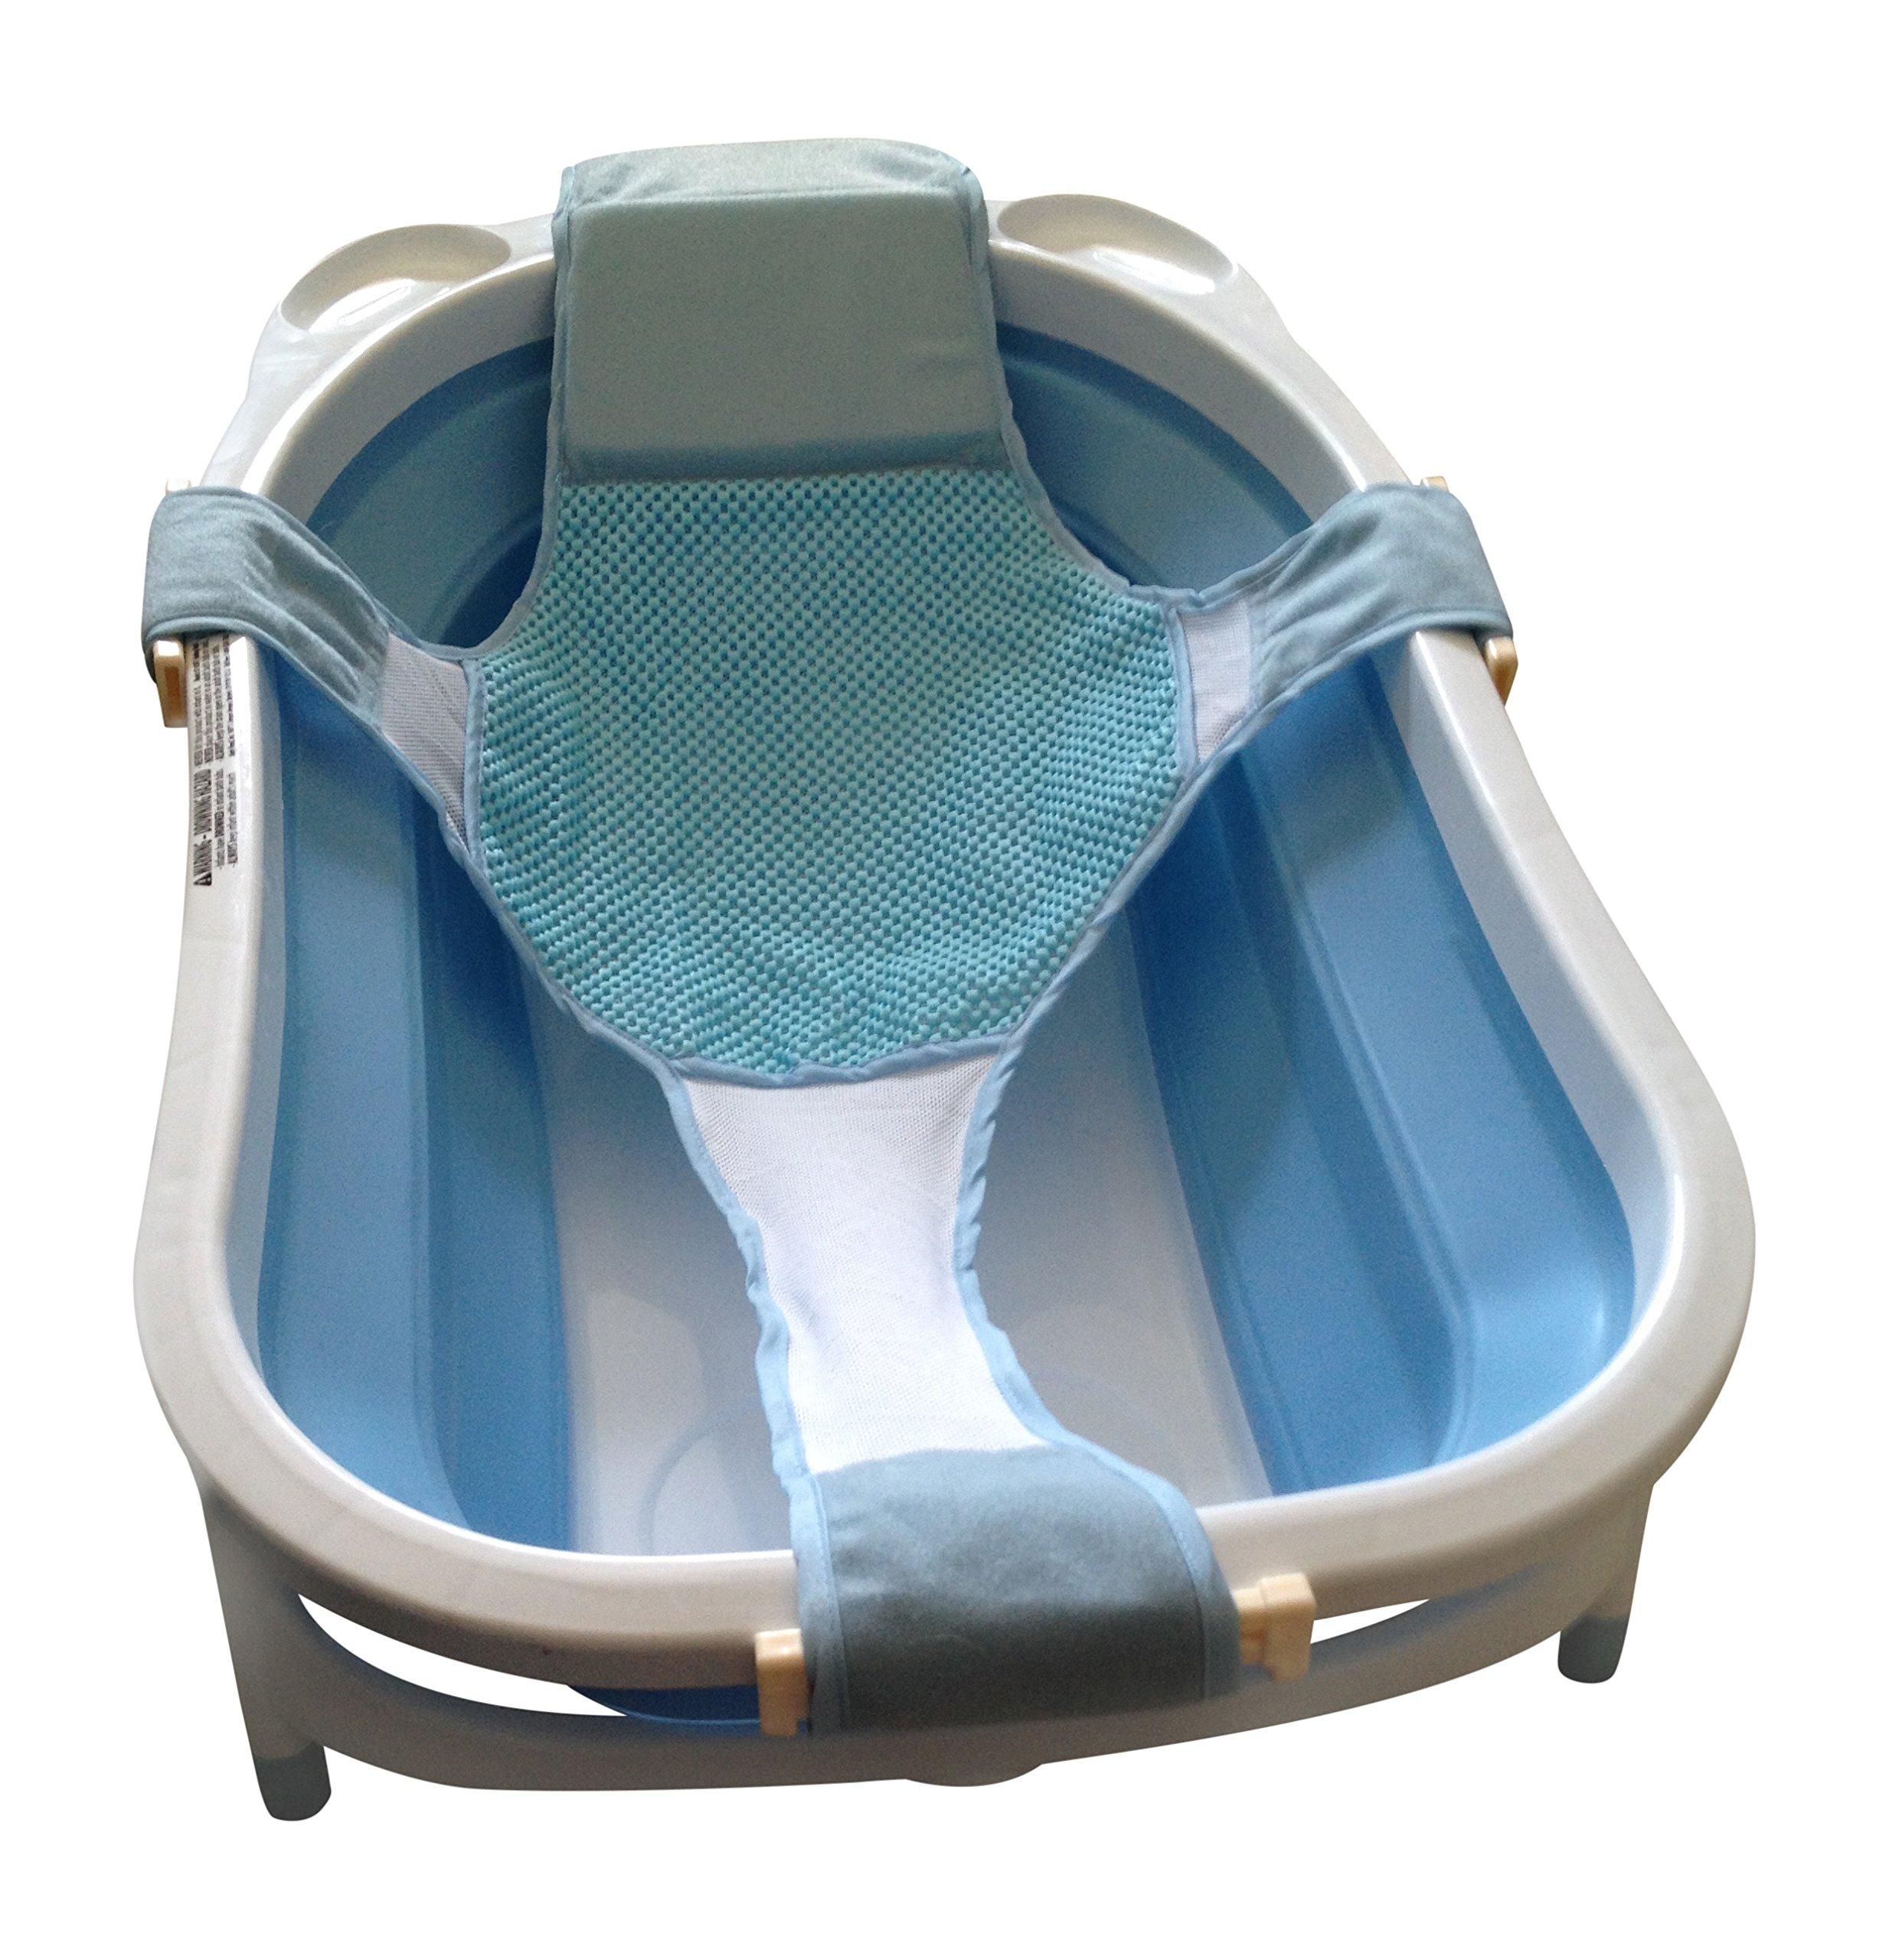 Baby Bathtub Seat Support Sling Hammock Net